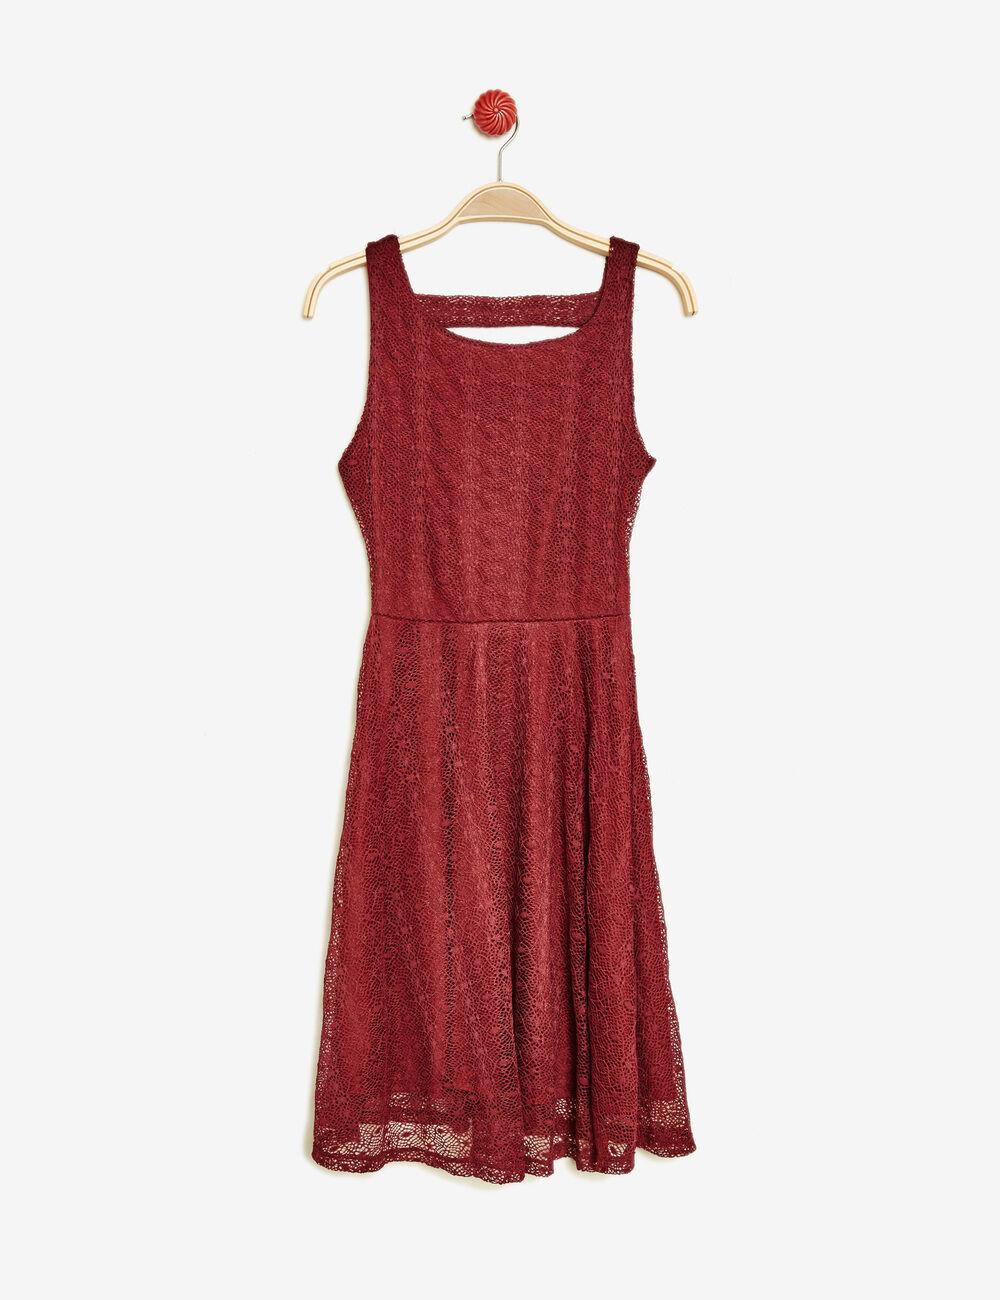 robe dentelle sans manches bordeaux femme jennyfer. Black Bedroom Furniture Sets. Home Design Ideas